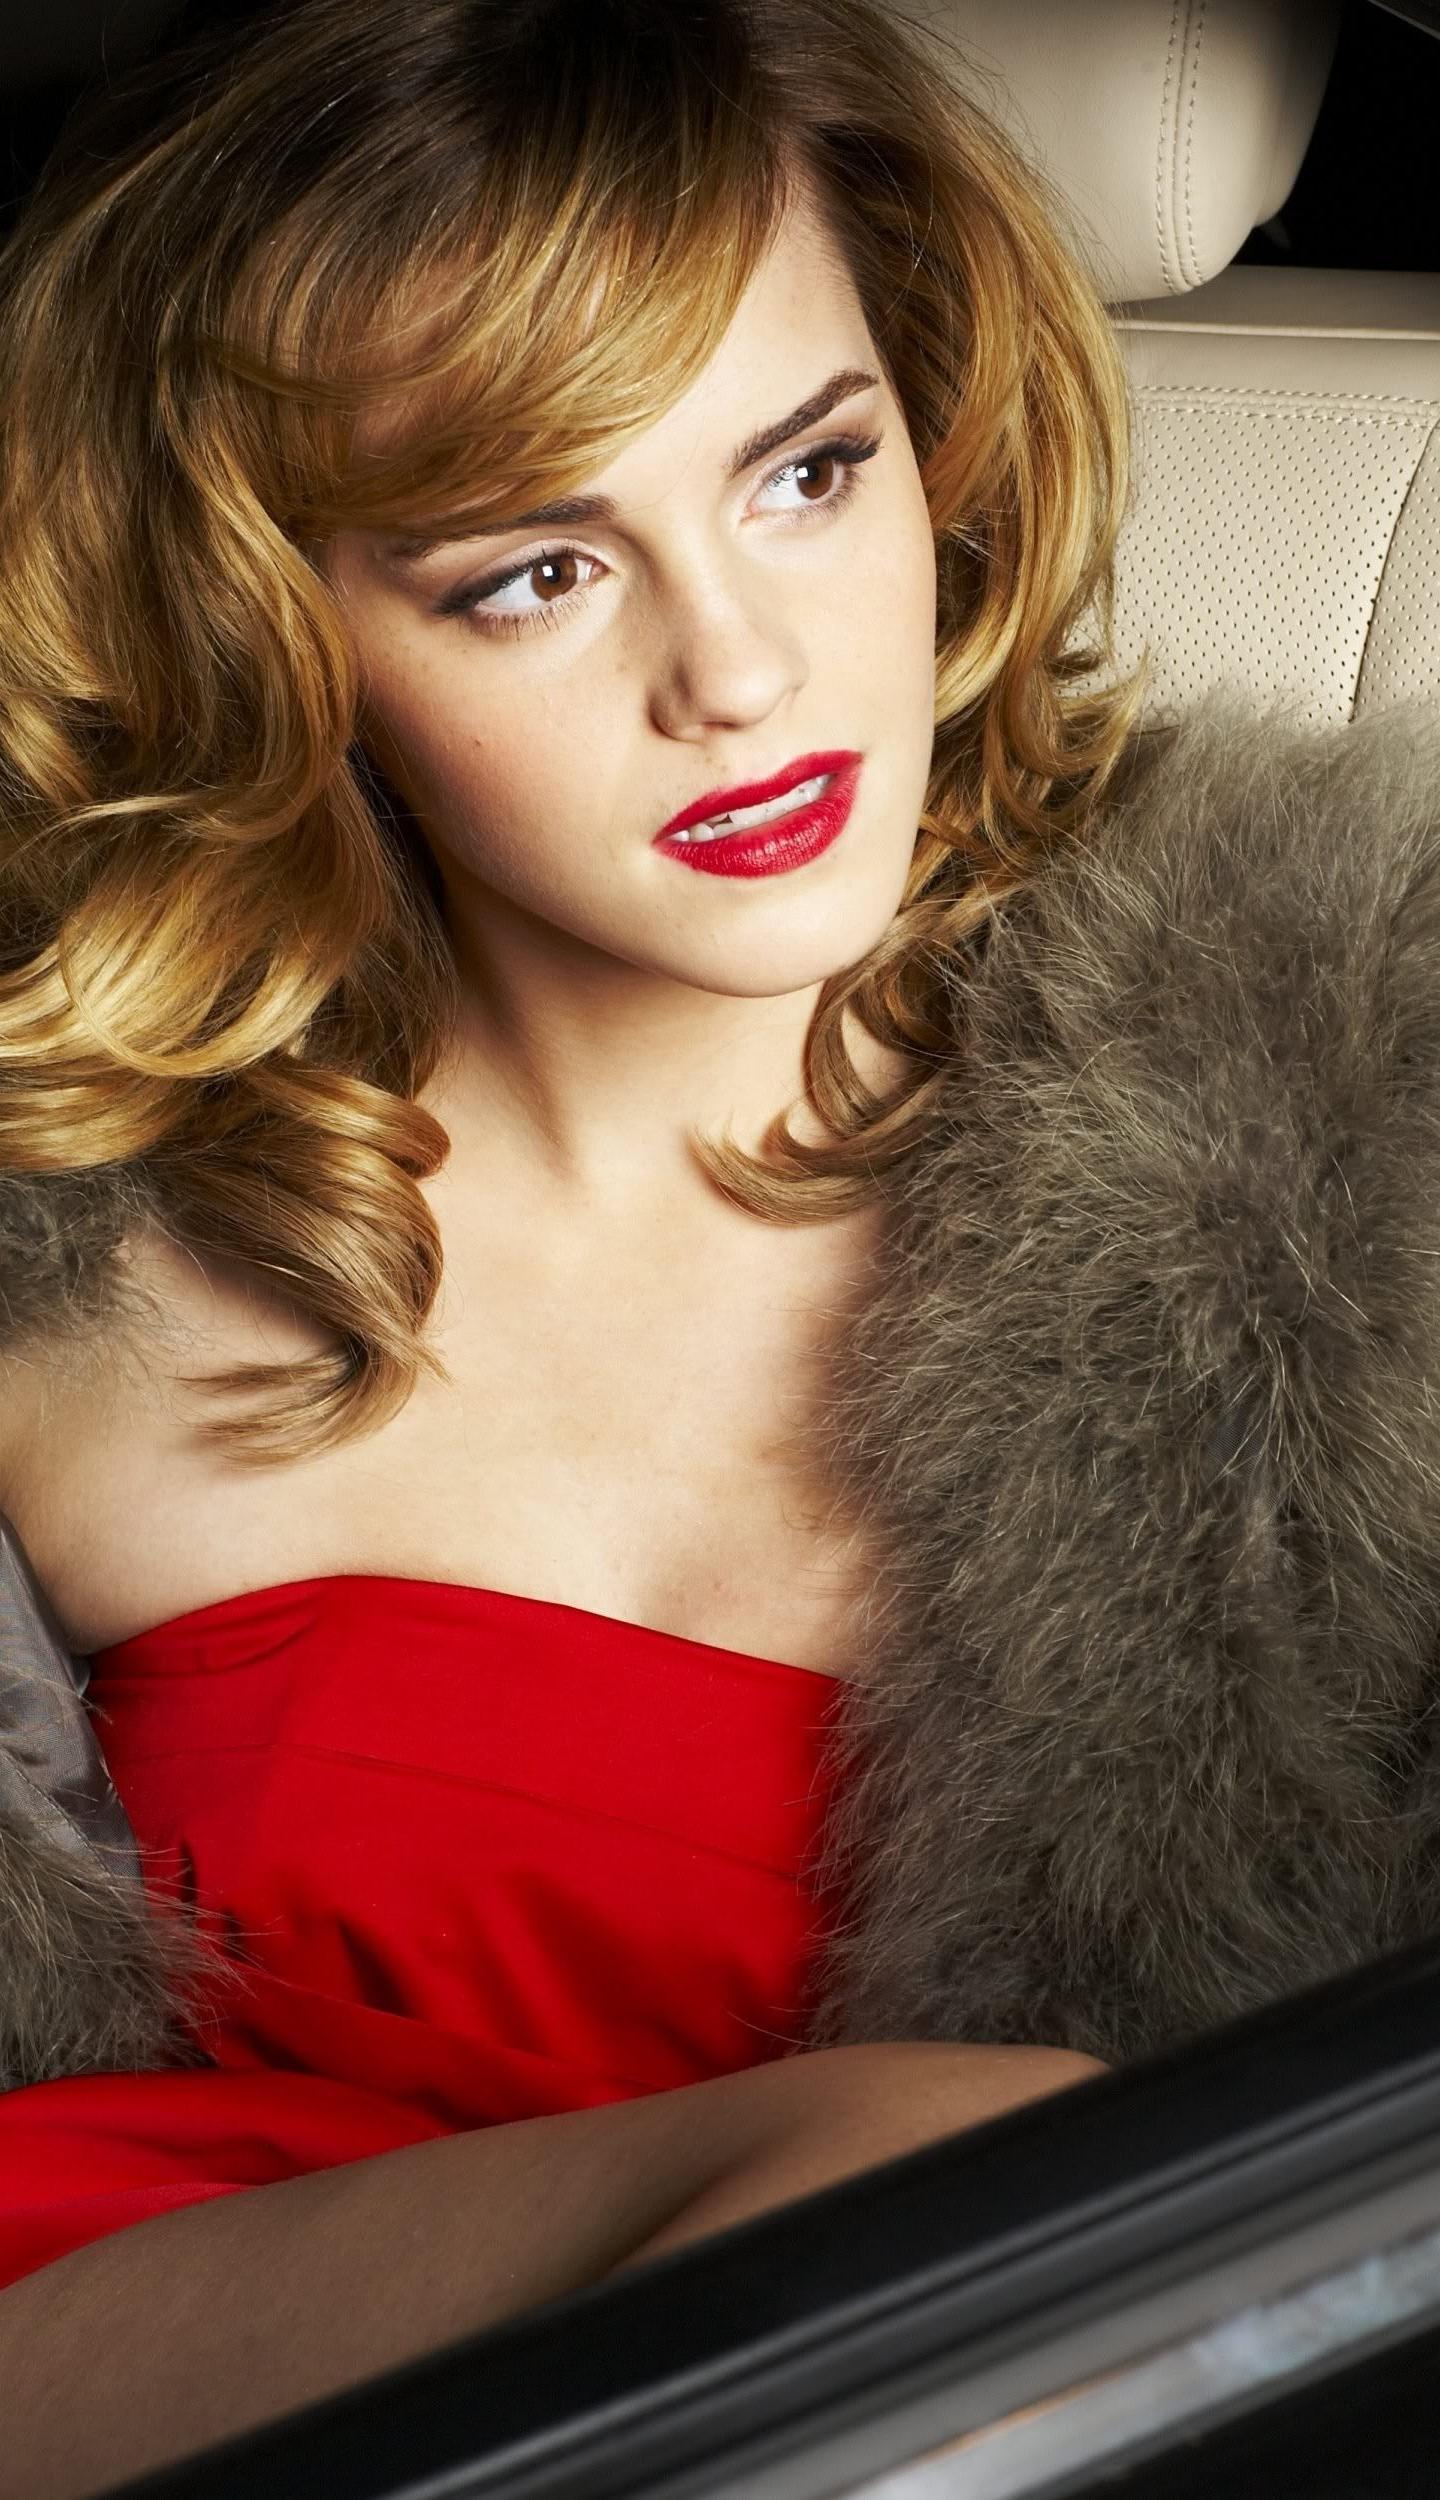 download 1440x2960 wallpaper emma watson, red dress, inside car